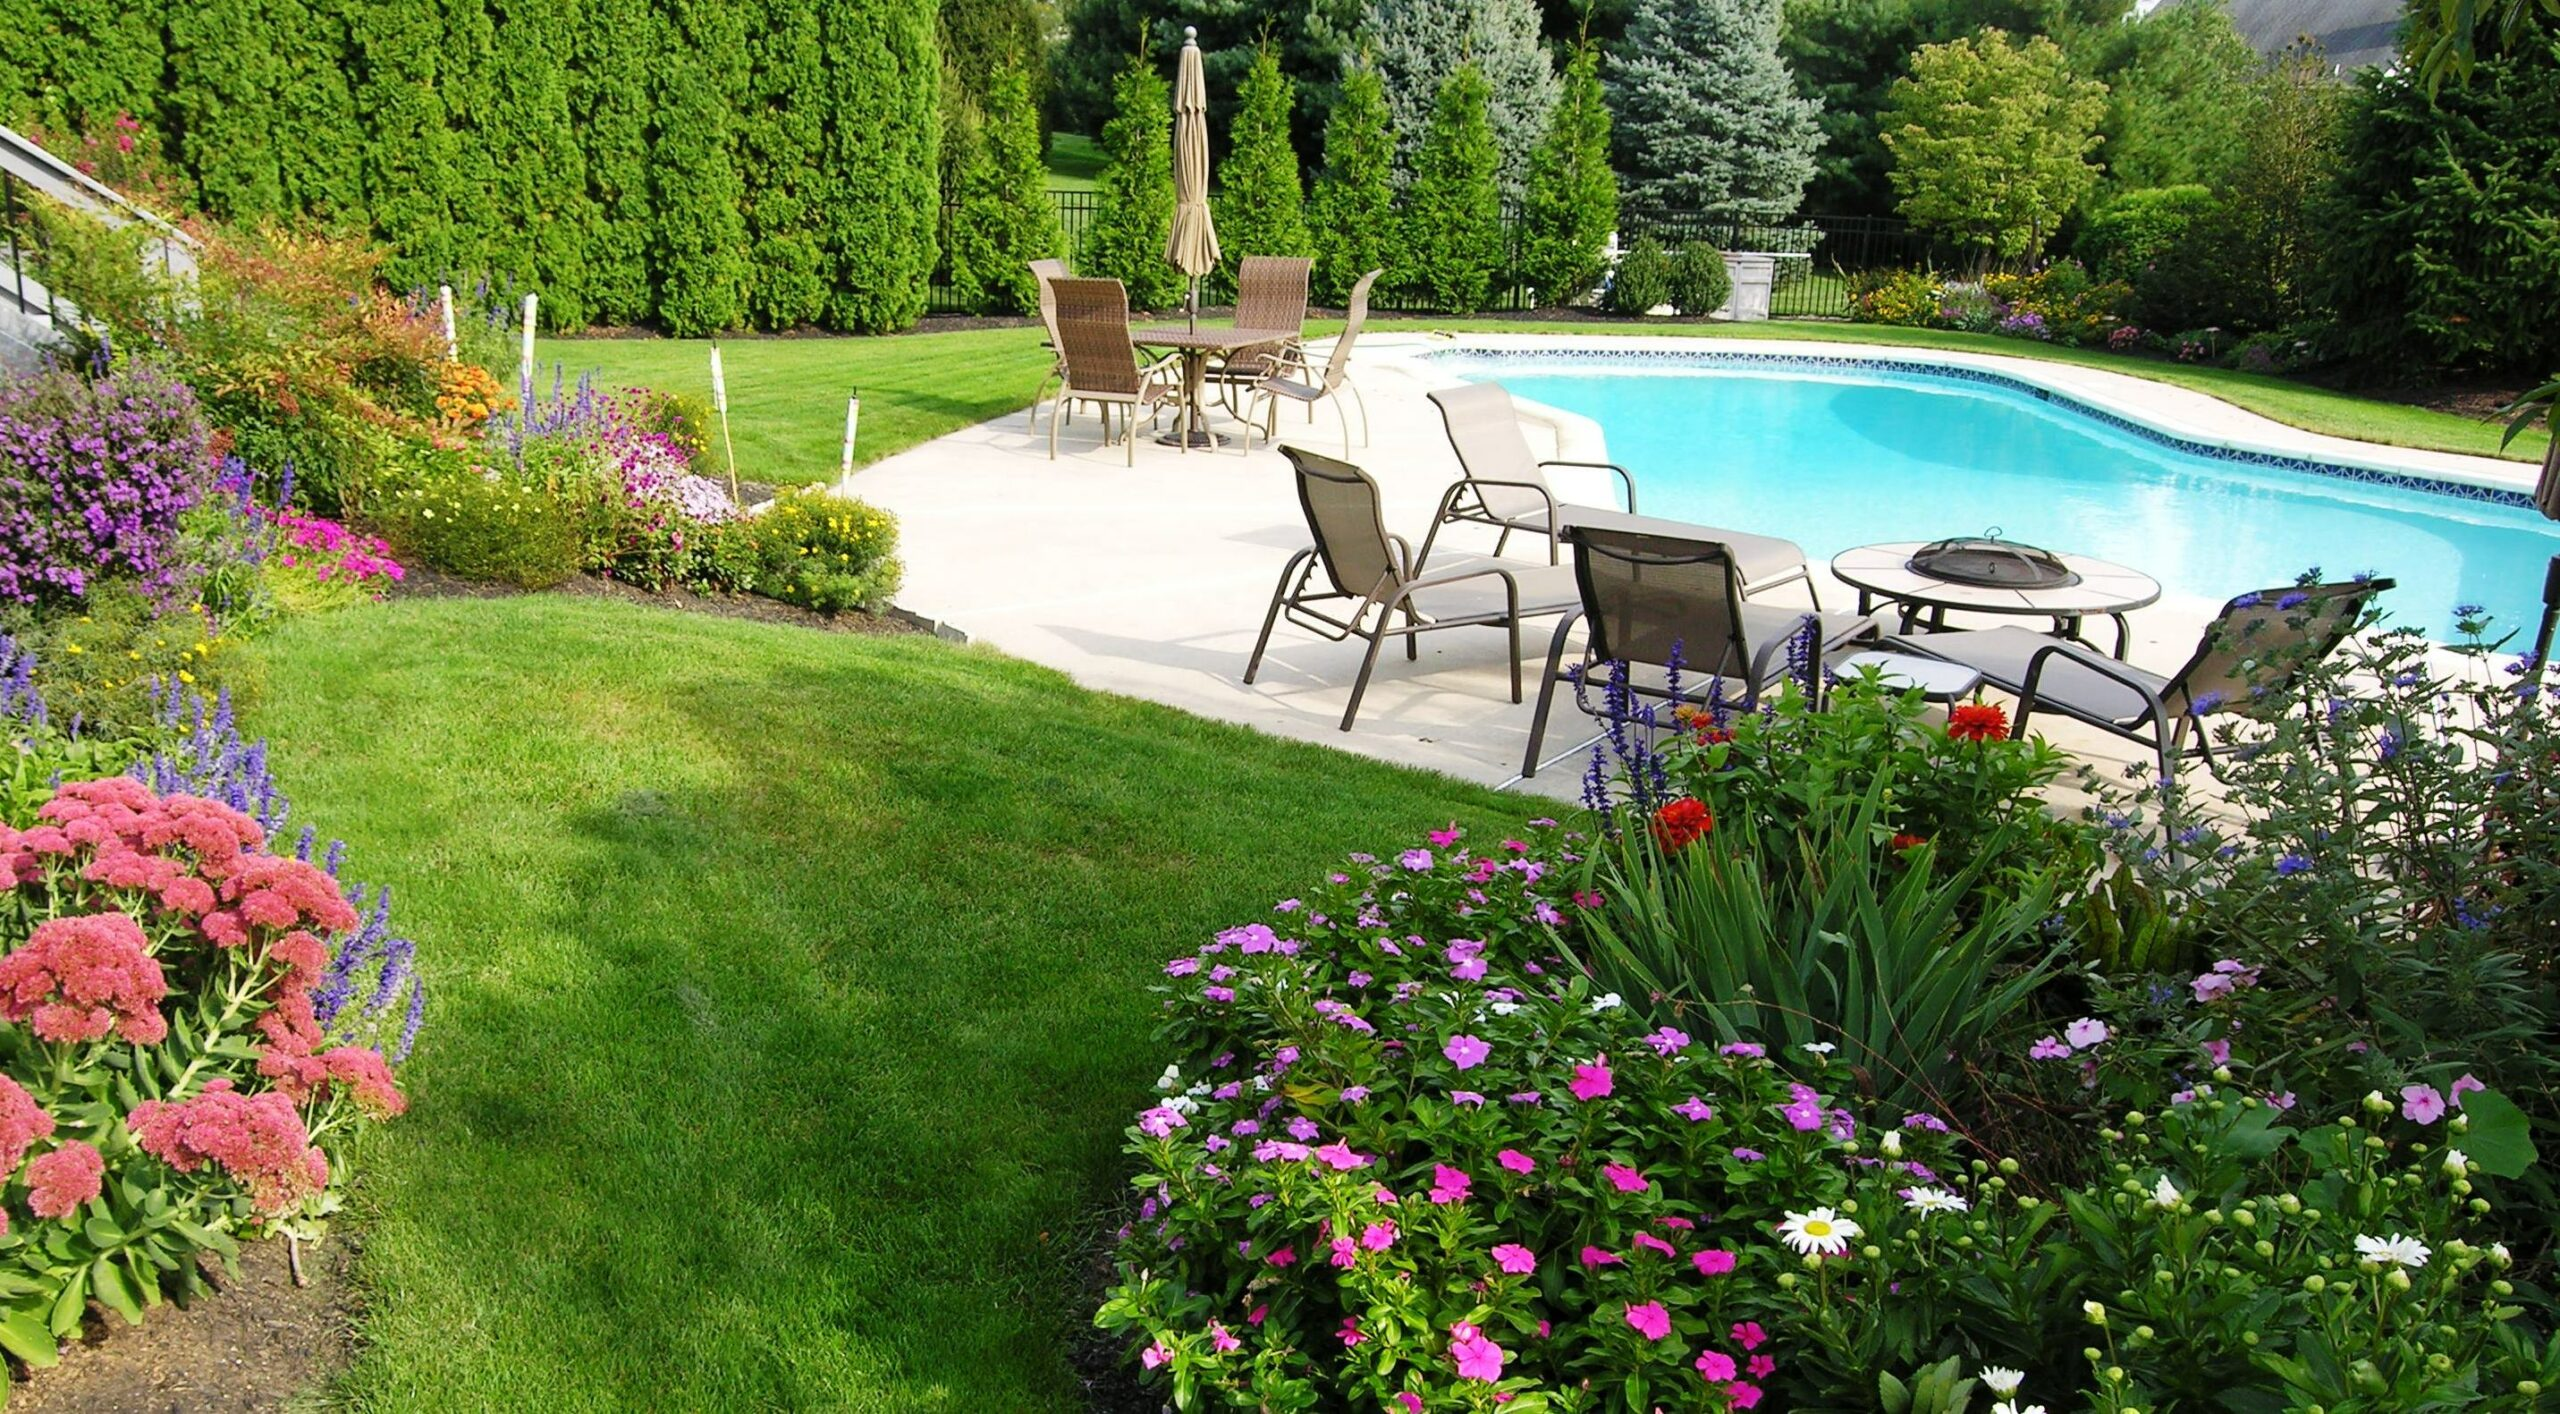 Diversity extends bloom through late summer, Lancaster, PA